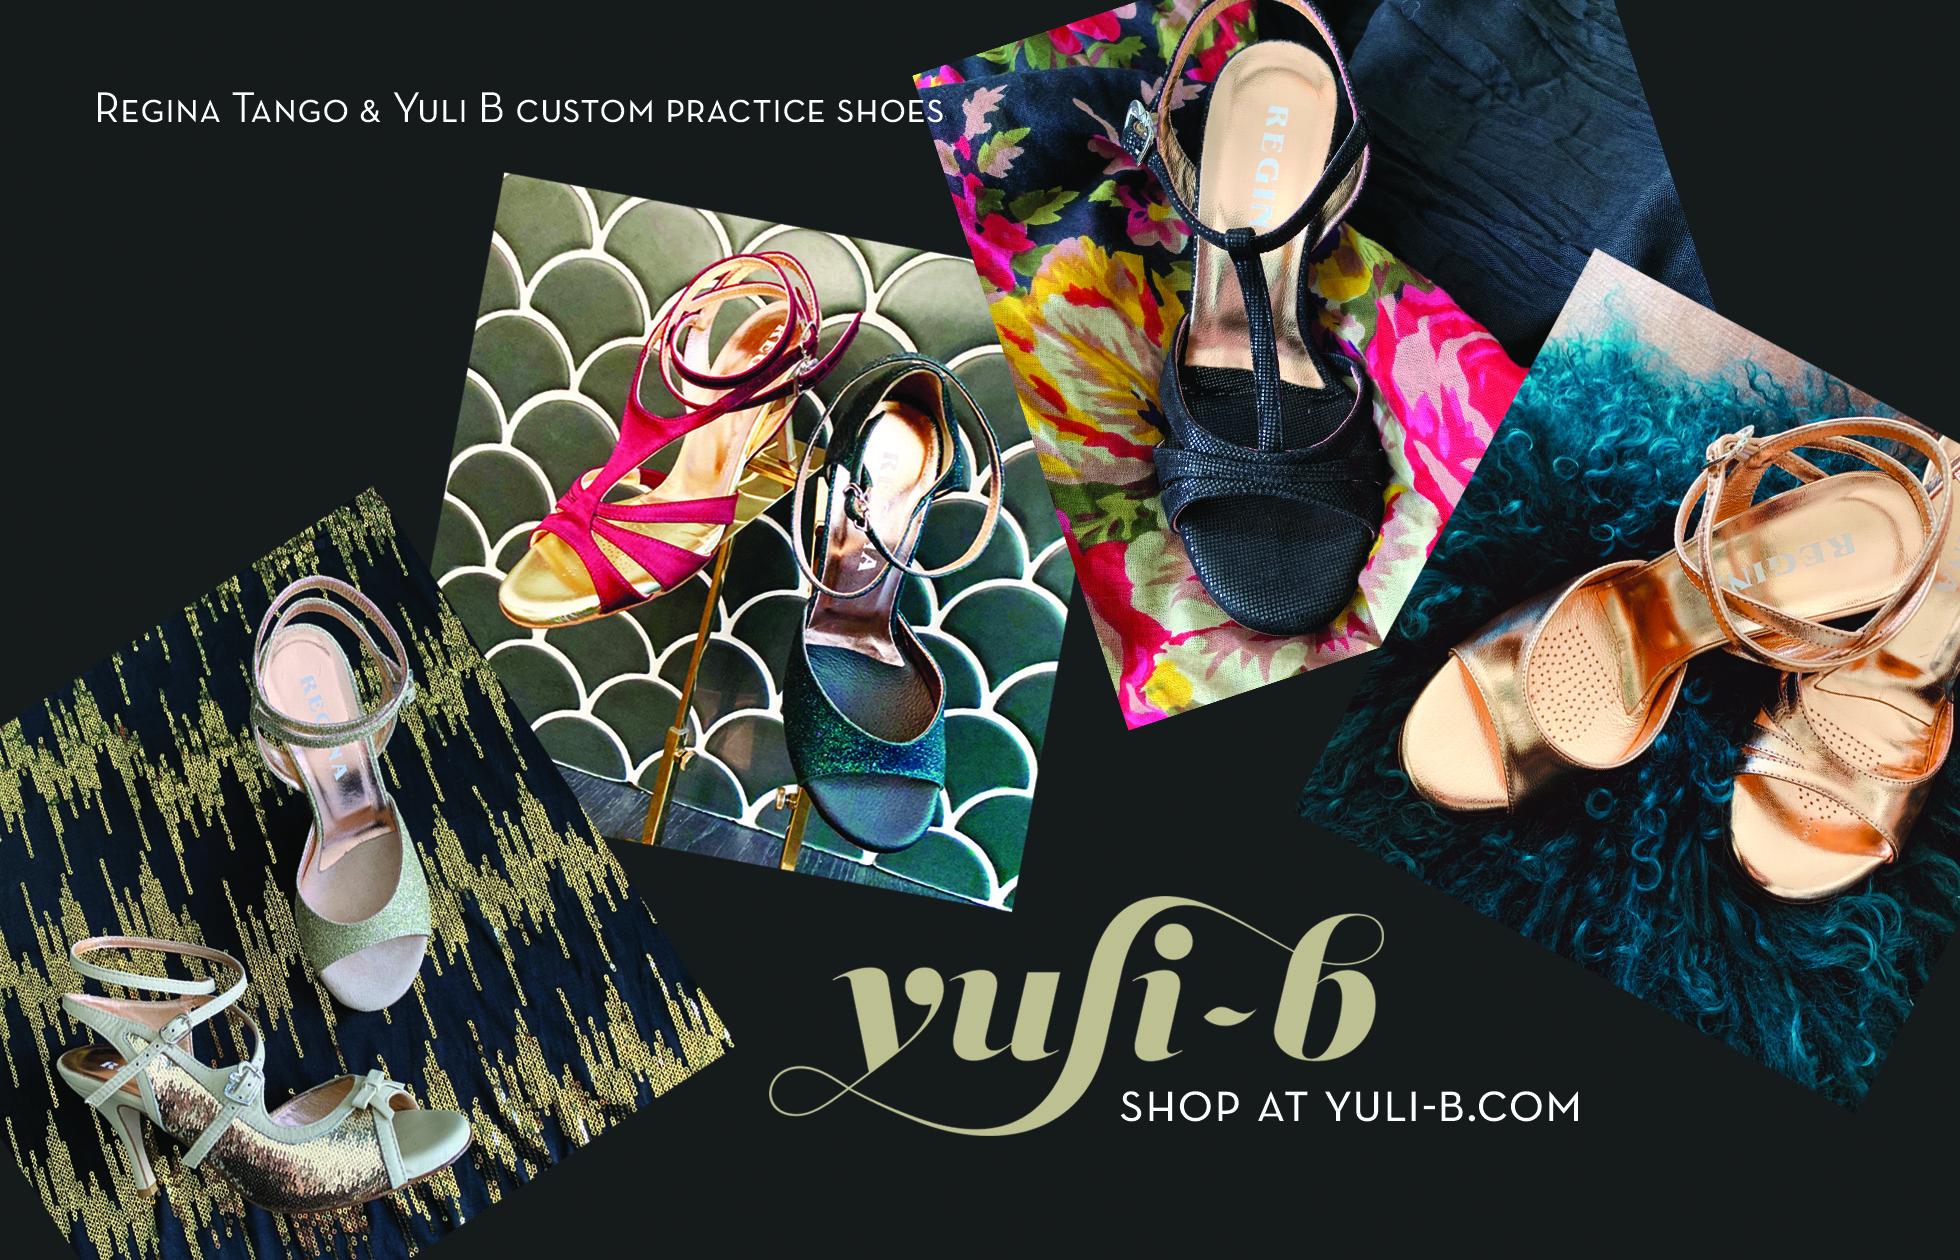 Yuli_B 2019 postcard-3.5inx5.5in-h_front.jpg